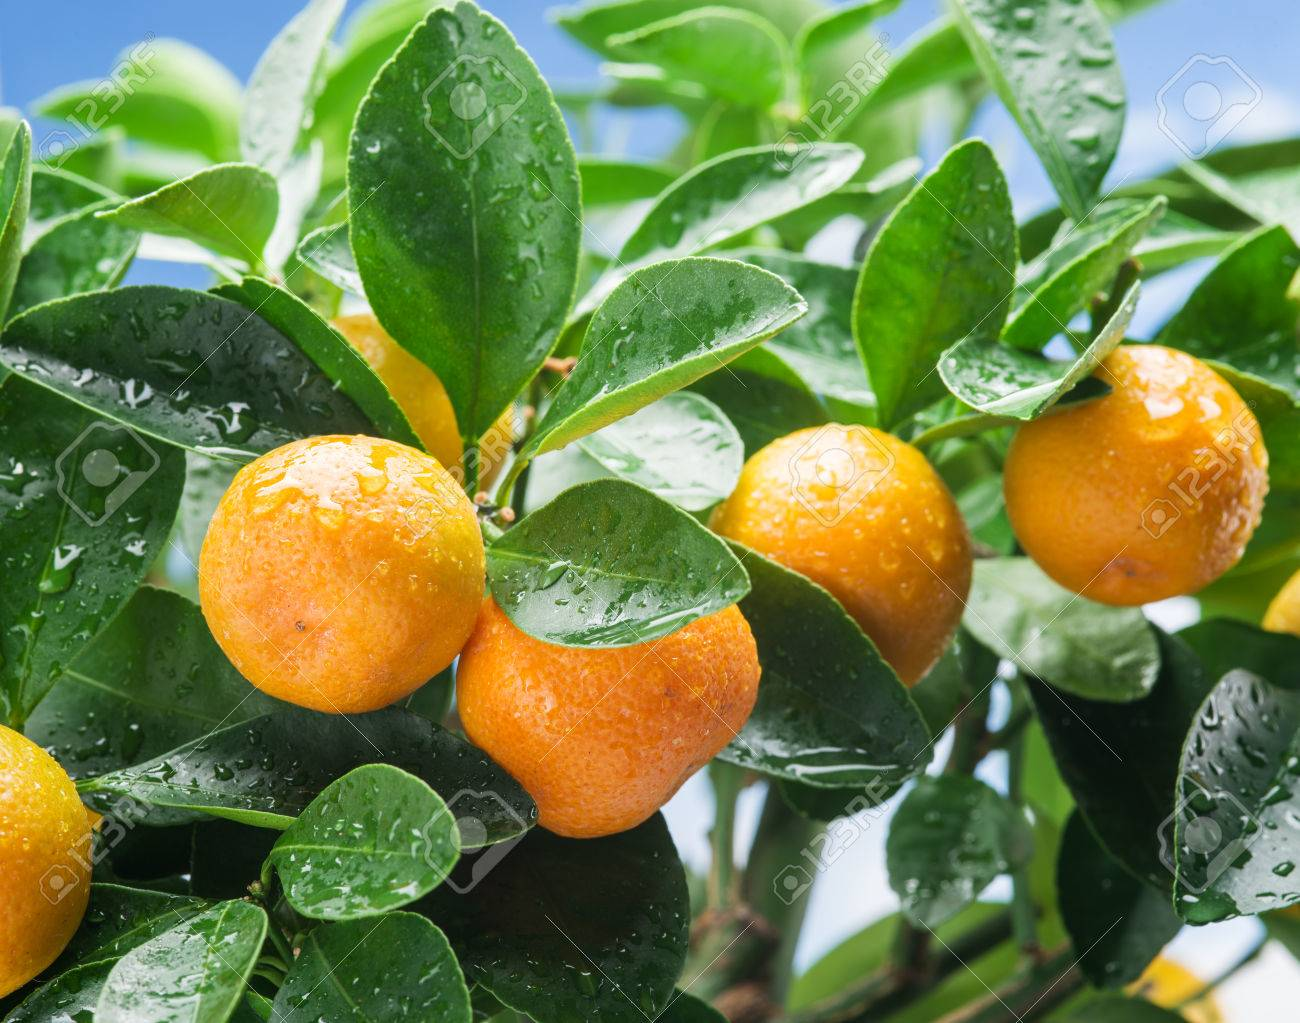 Ripe tangerine fruits on the tree. Blue sky background. Standard-Bild - 58735609